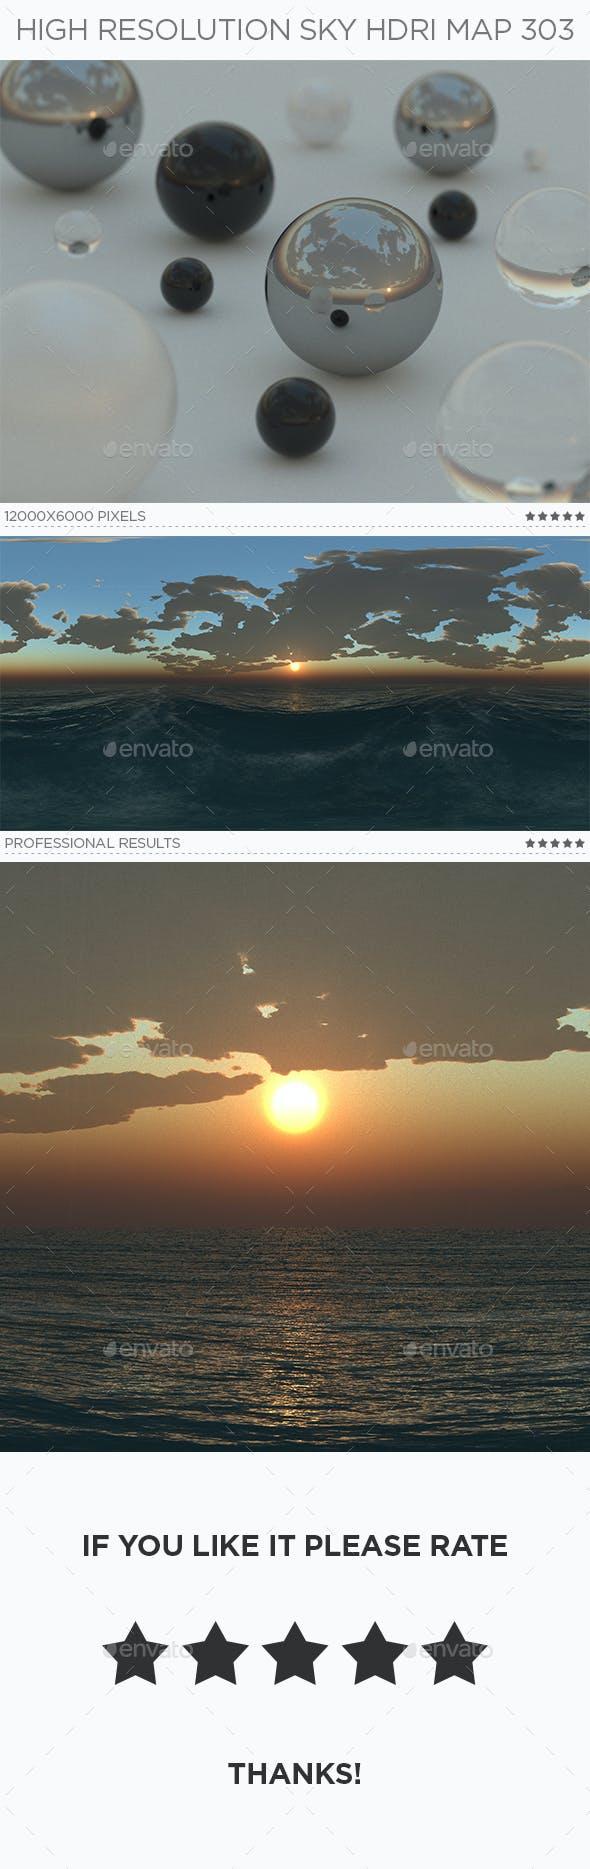 High Resolution Sky HDRi Map 303 - 3DOcean Item for Sale